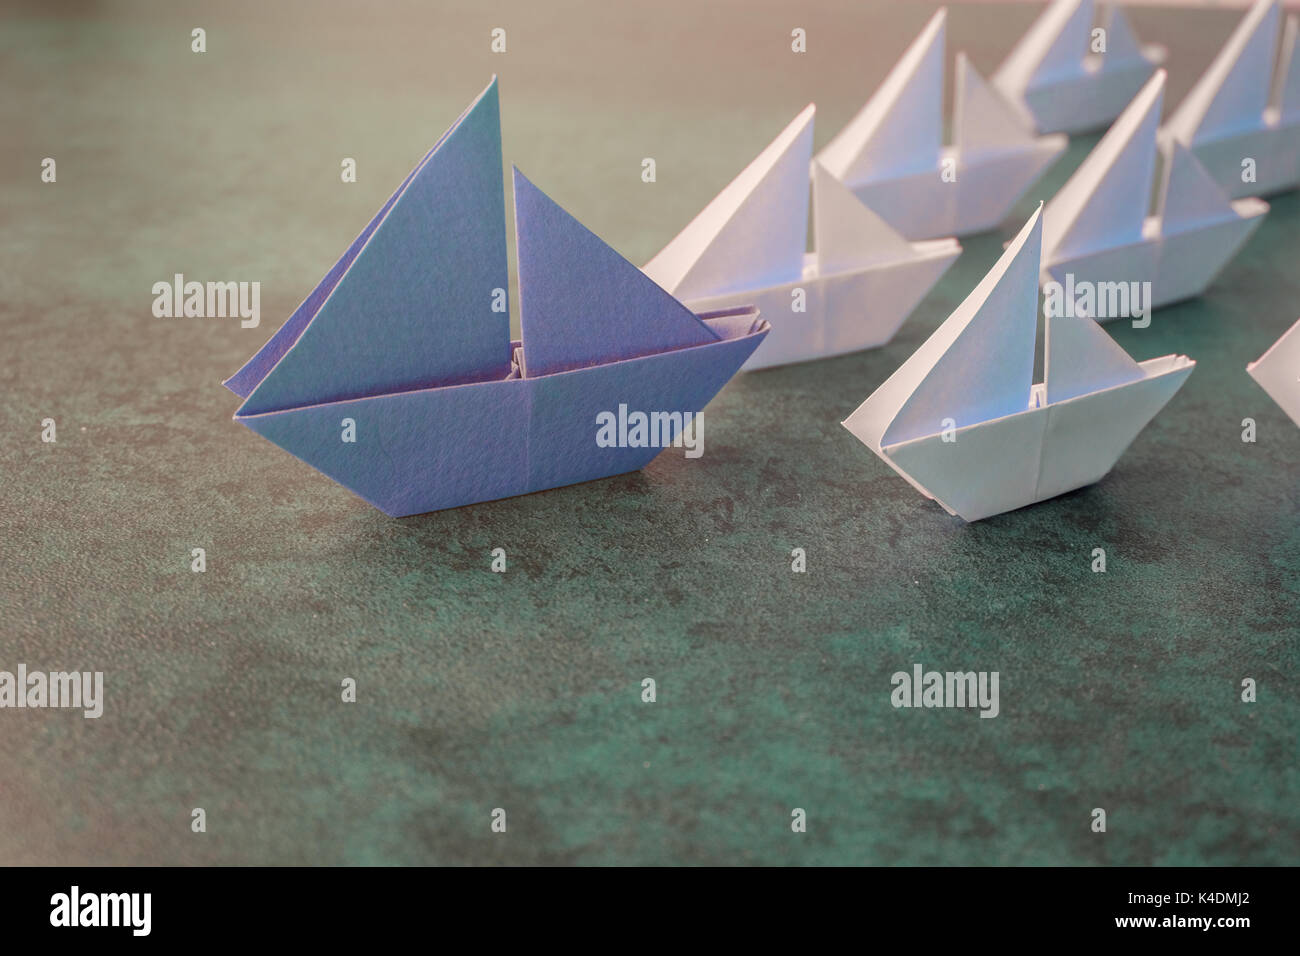 Veleros de papel origami, concepto de negocio de liderazgo, tonificación Imagen De Stock